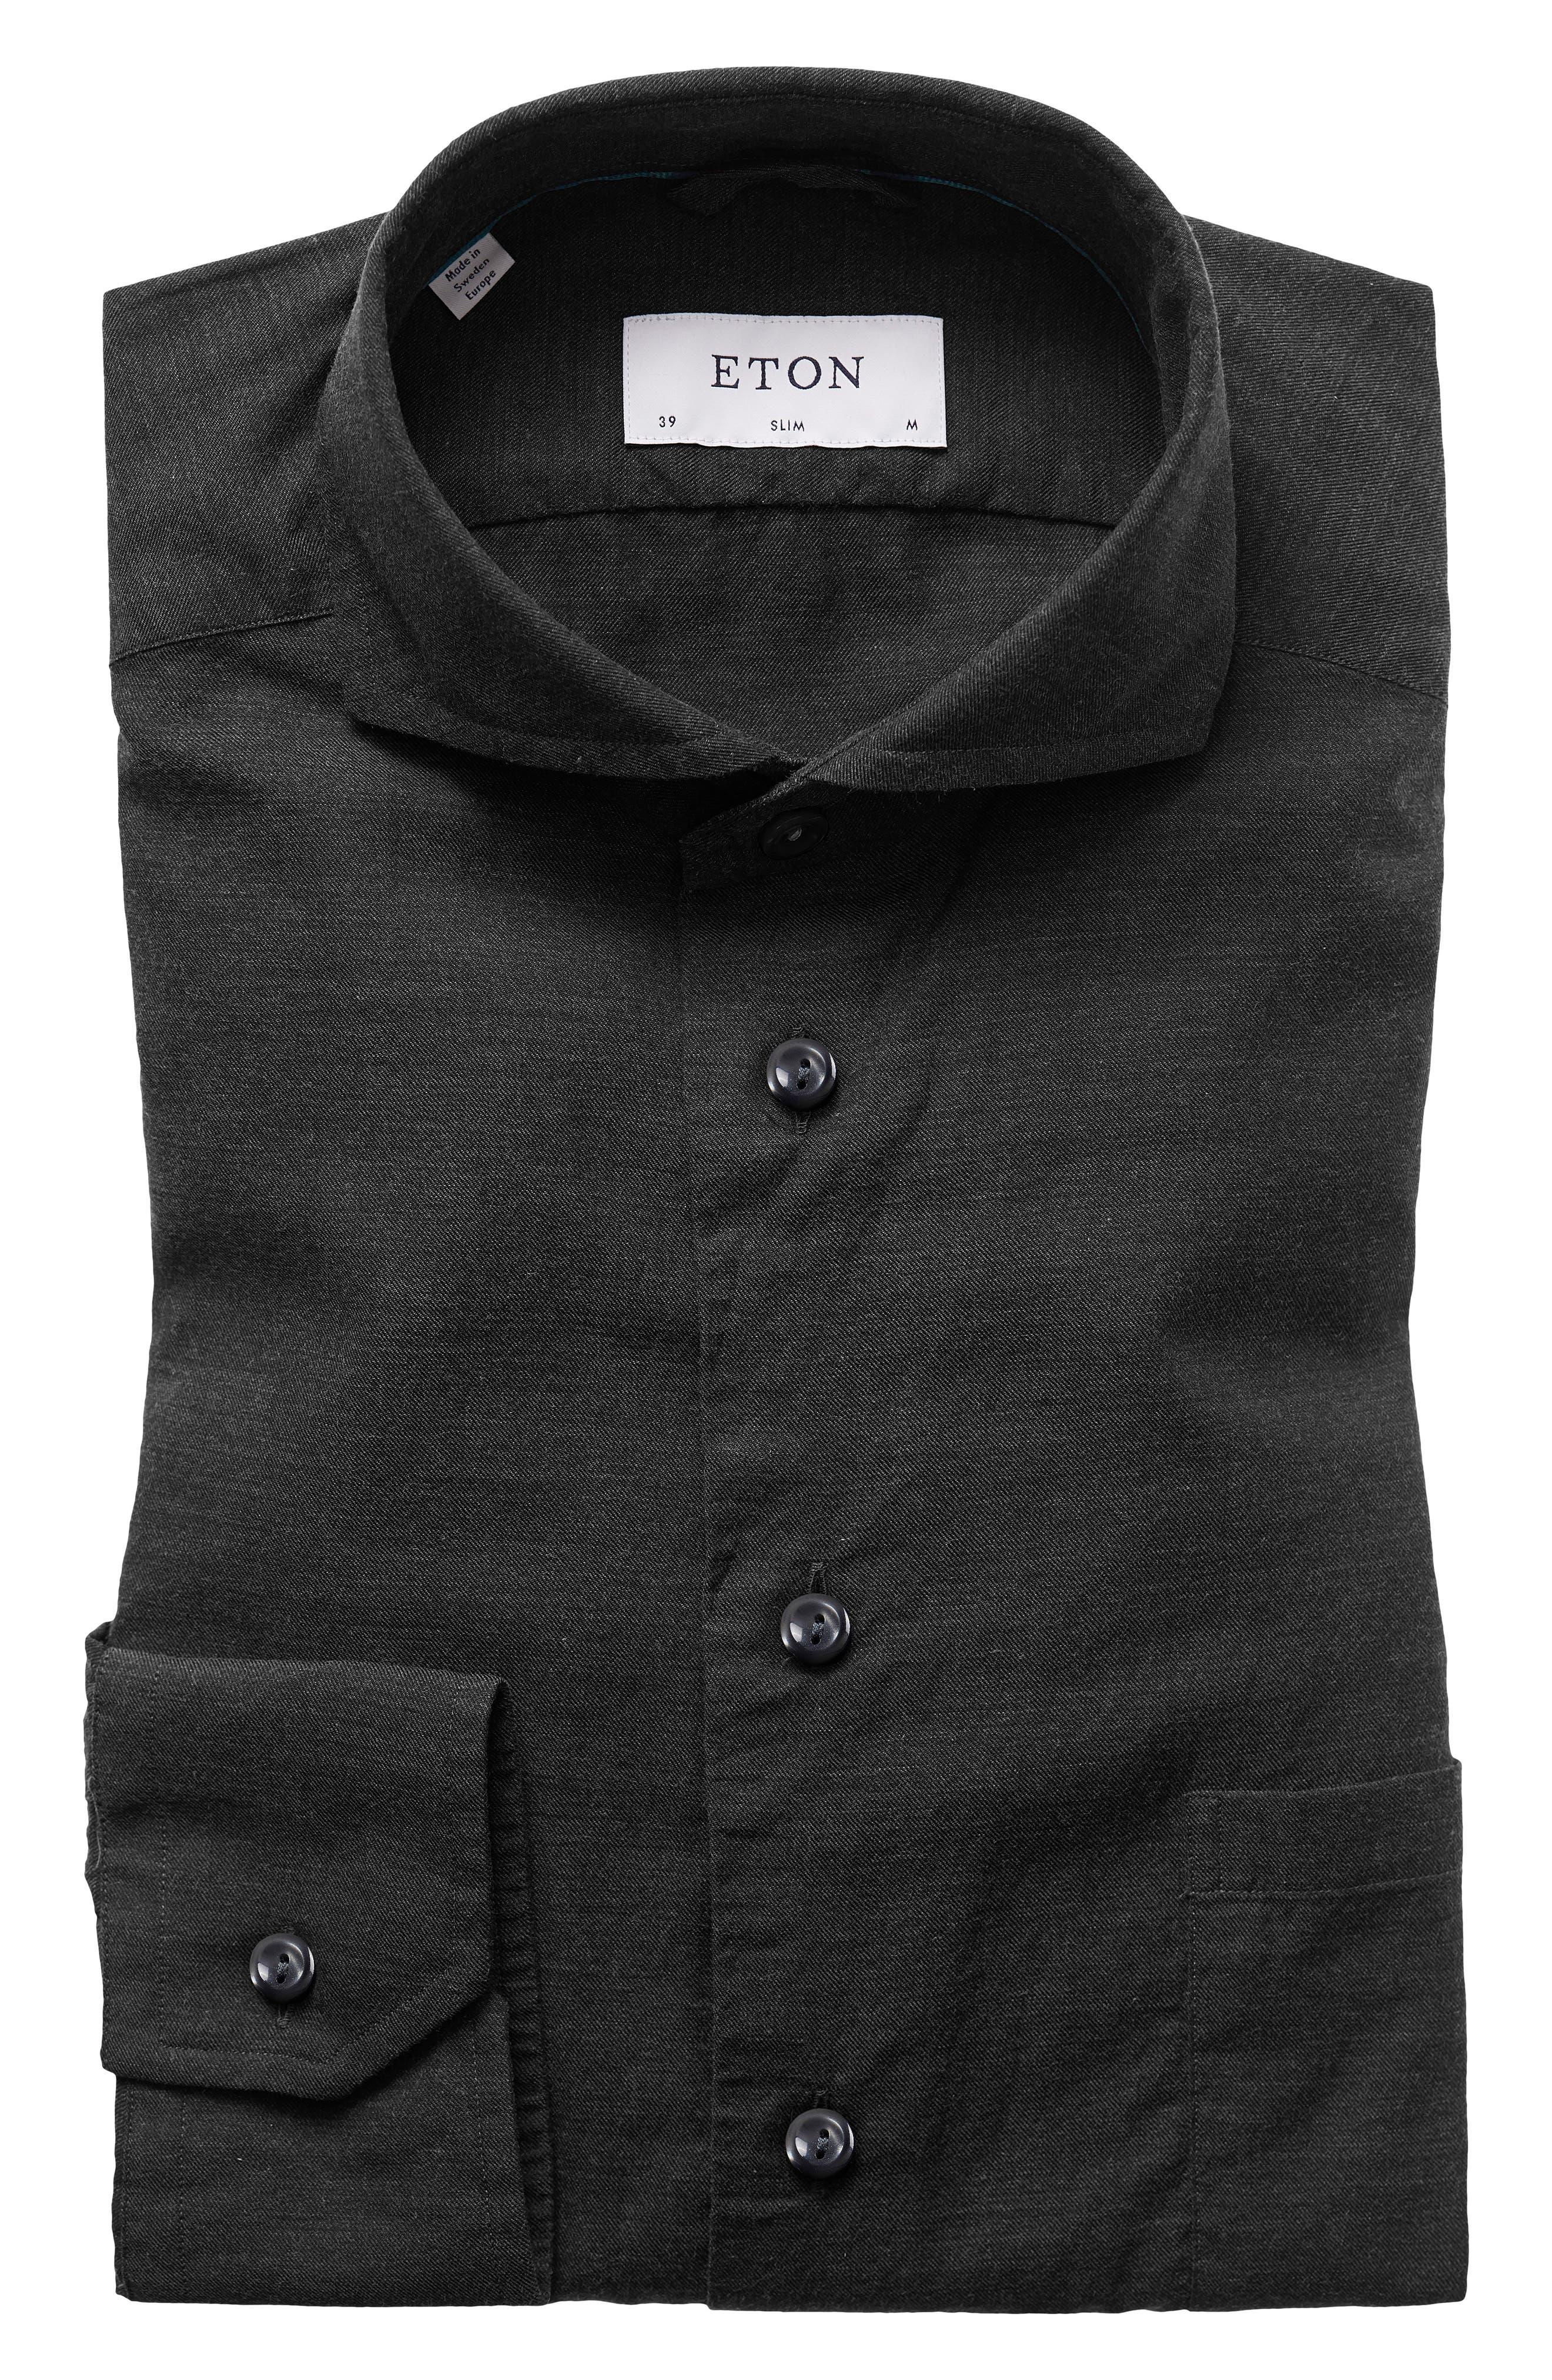 ETON Slim Fit Solid Dress Shirt, Main, color, 001